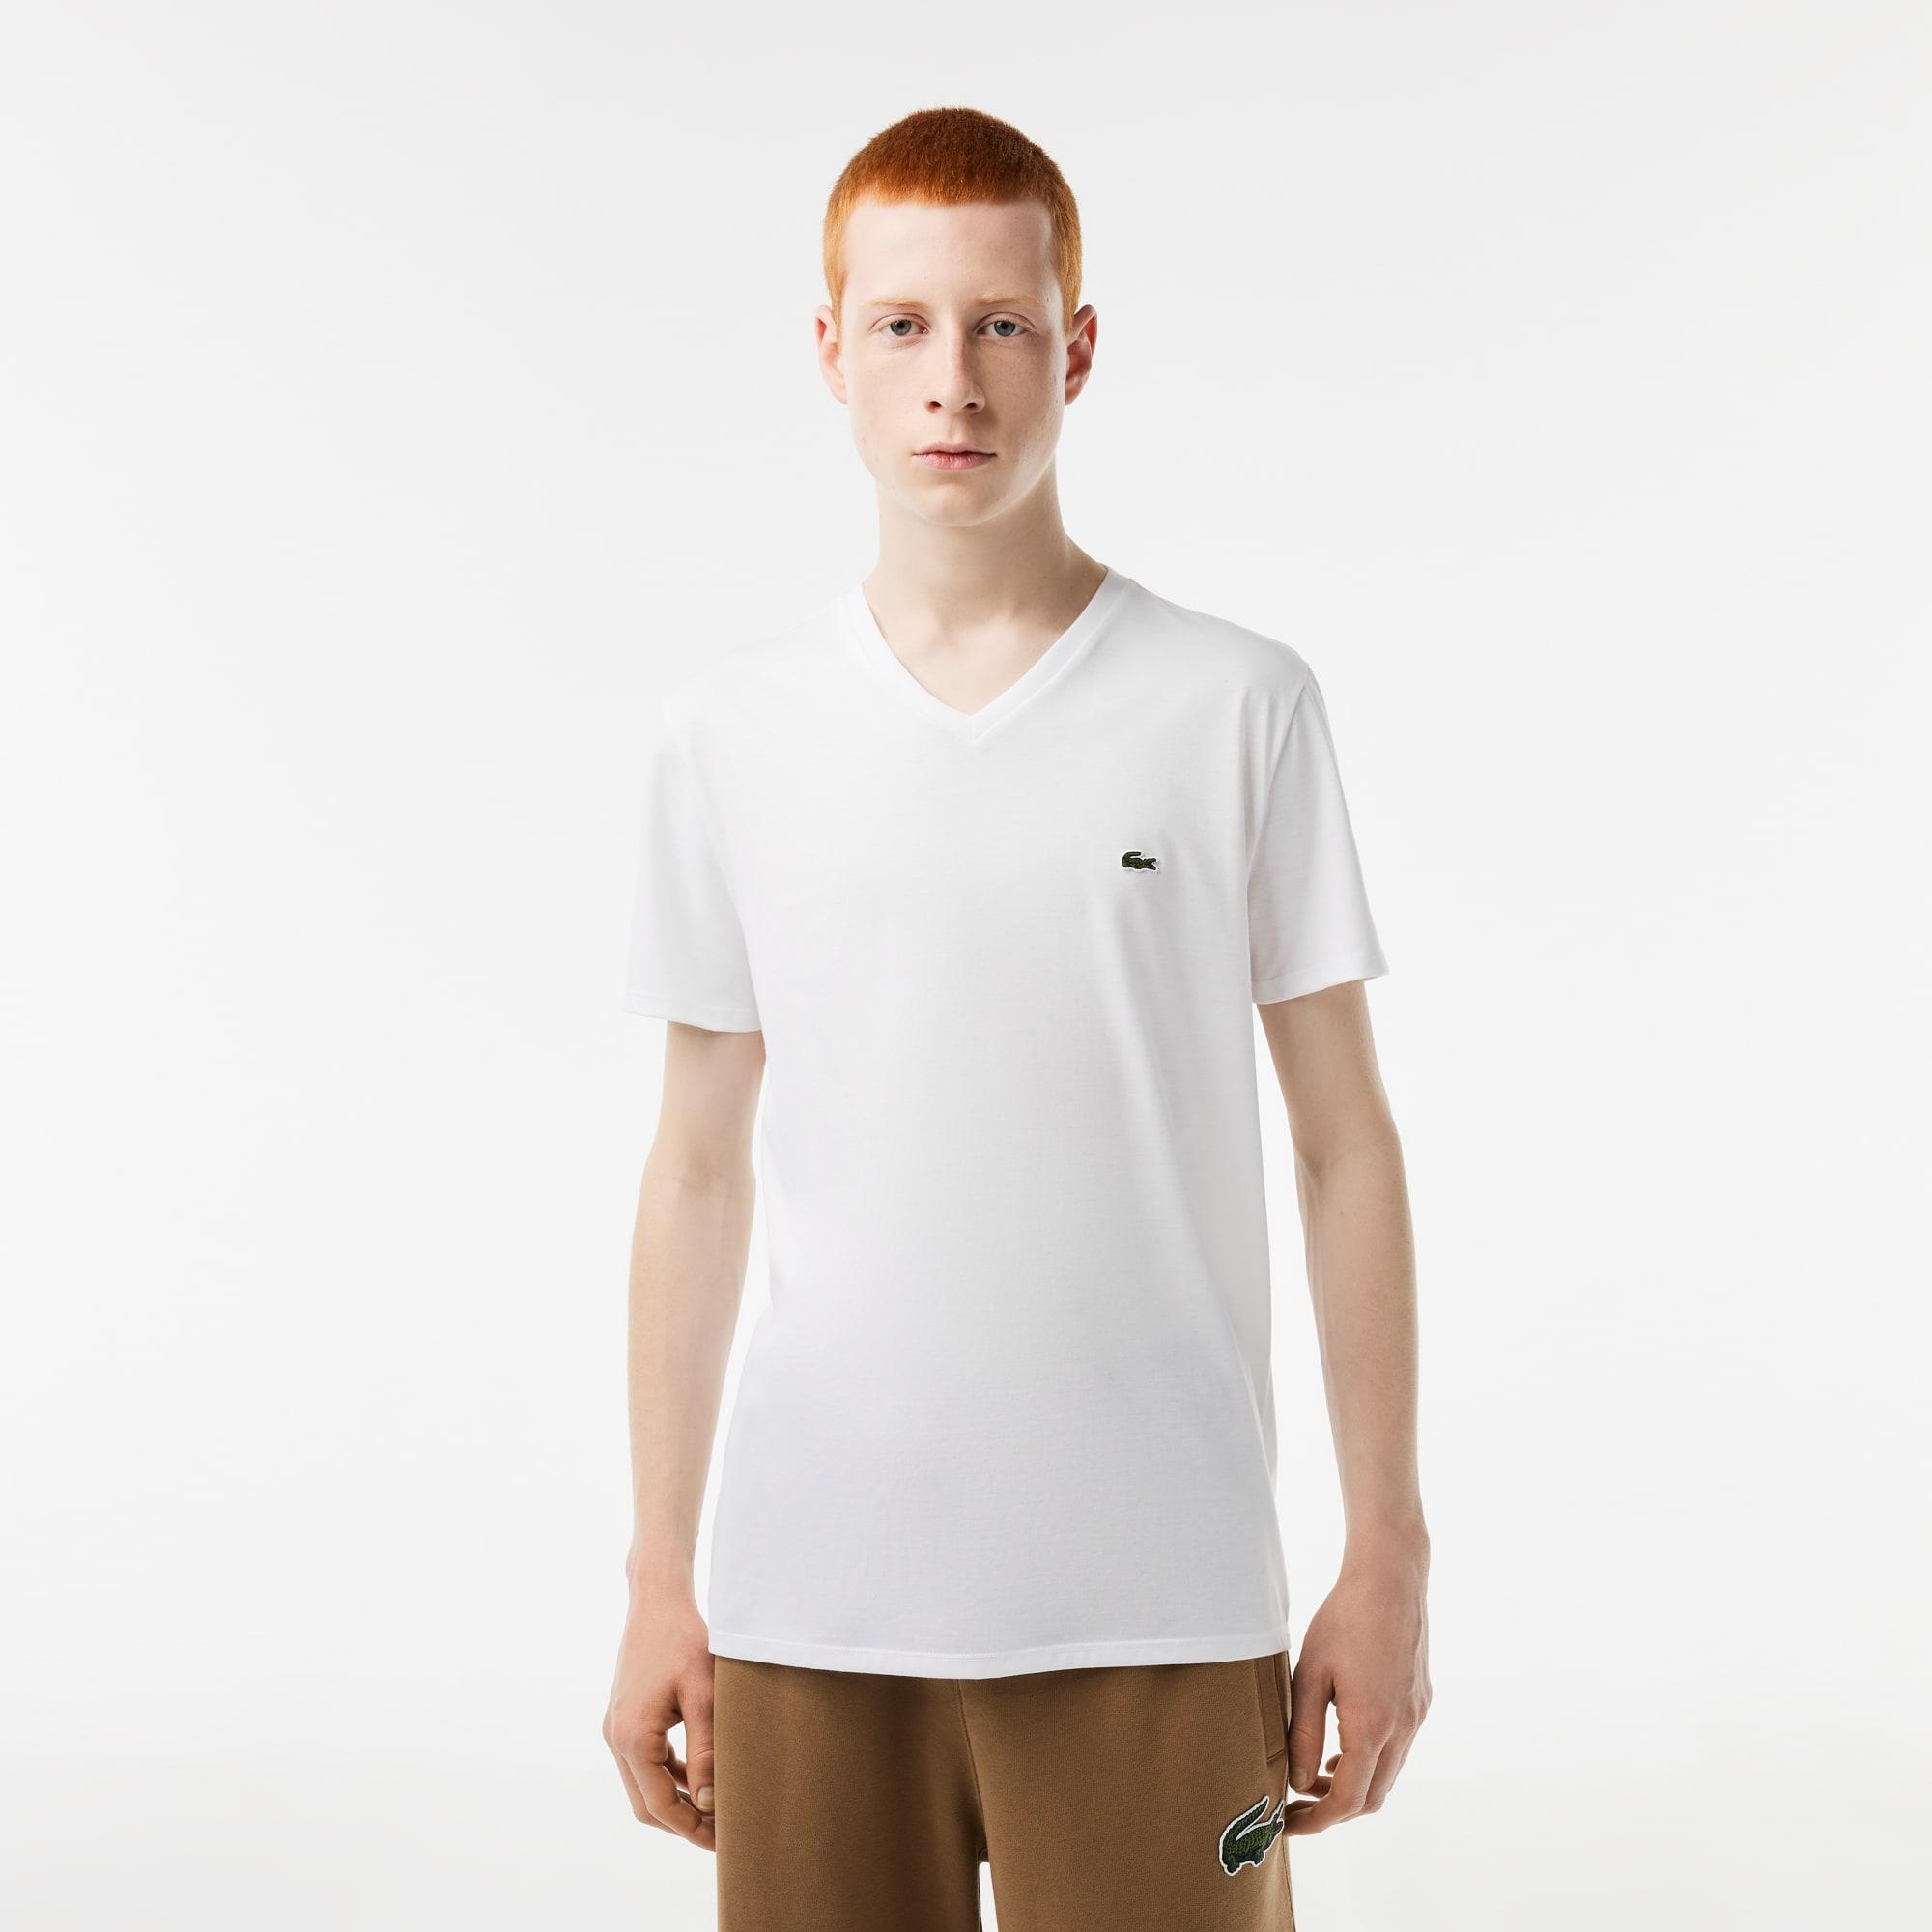 Camisetas   Moda Masculina   LACOSTE 83eb63ee6b